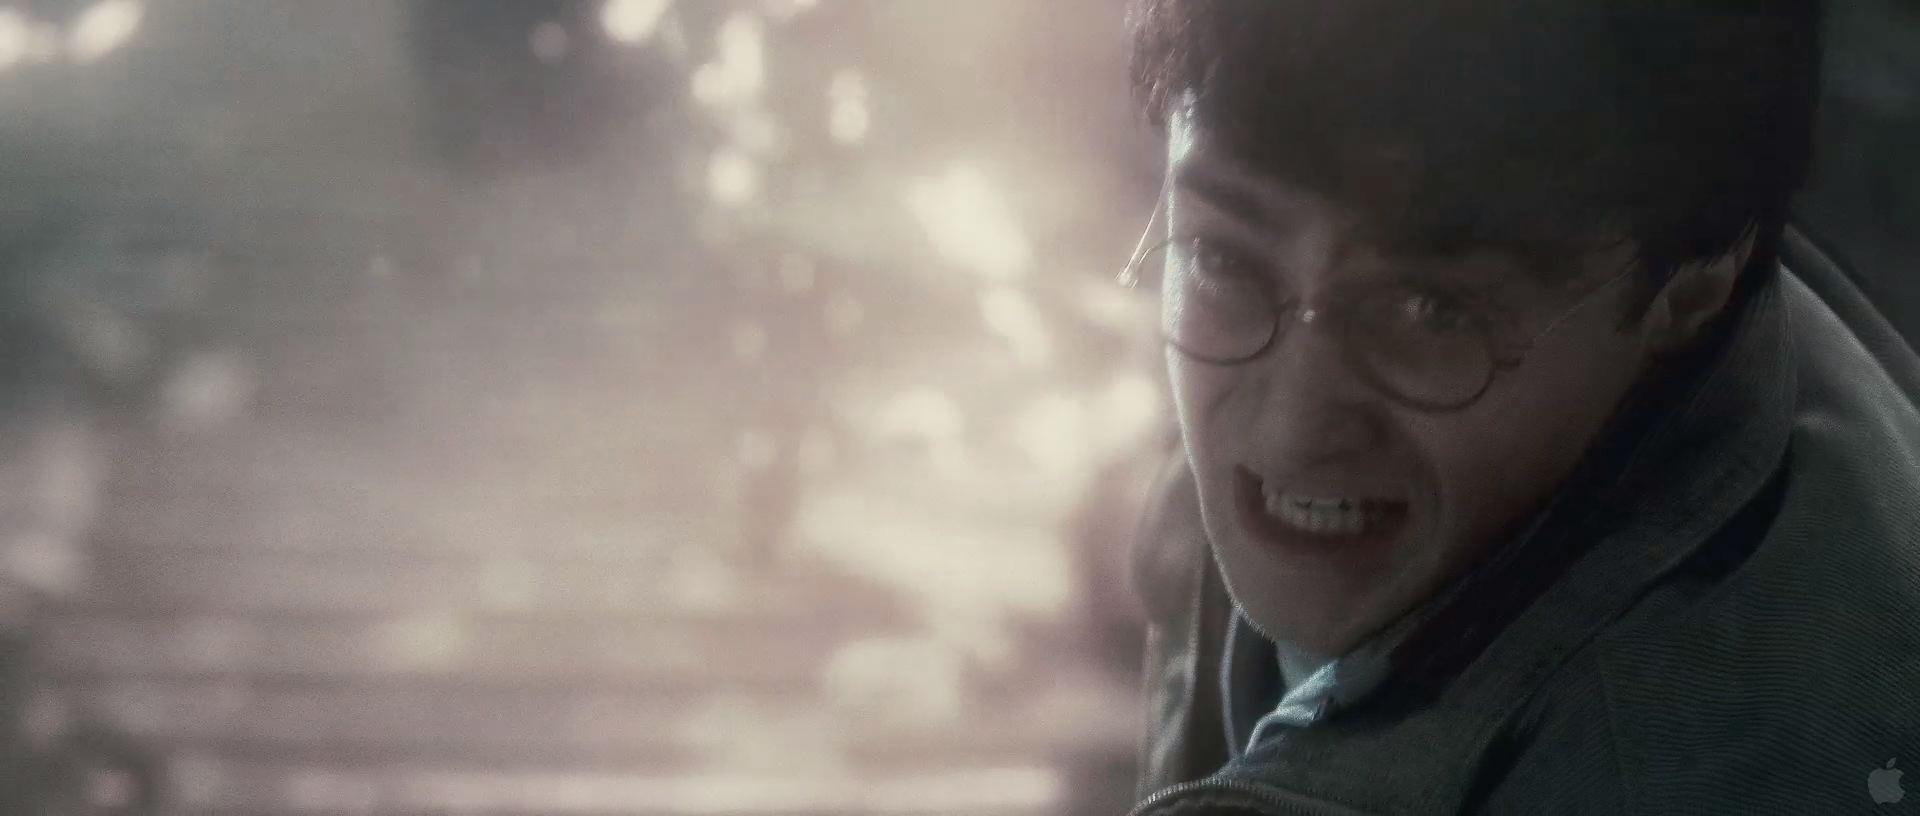 Harry Potter BlogHogwarts HP7 2 Trailer 92